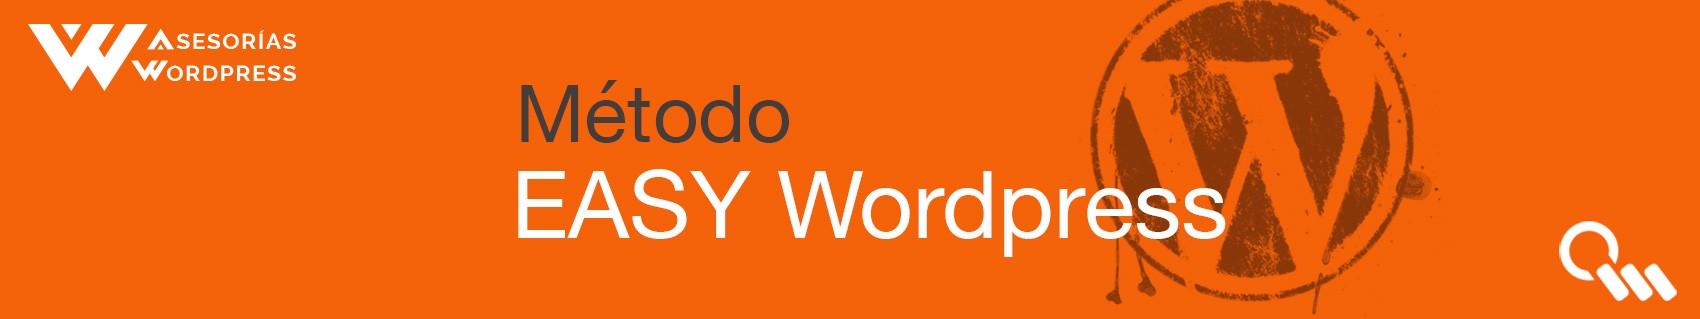 Banner-metodo-Easy-Wordpress-wordpress-carlos-marcano